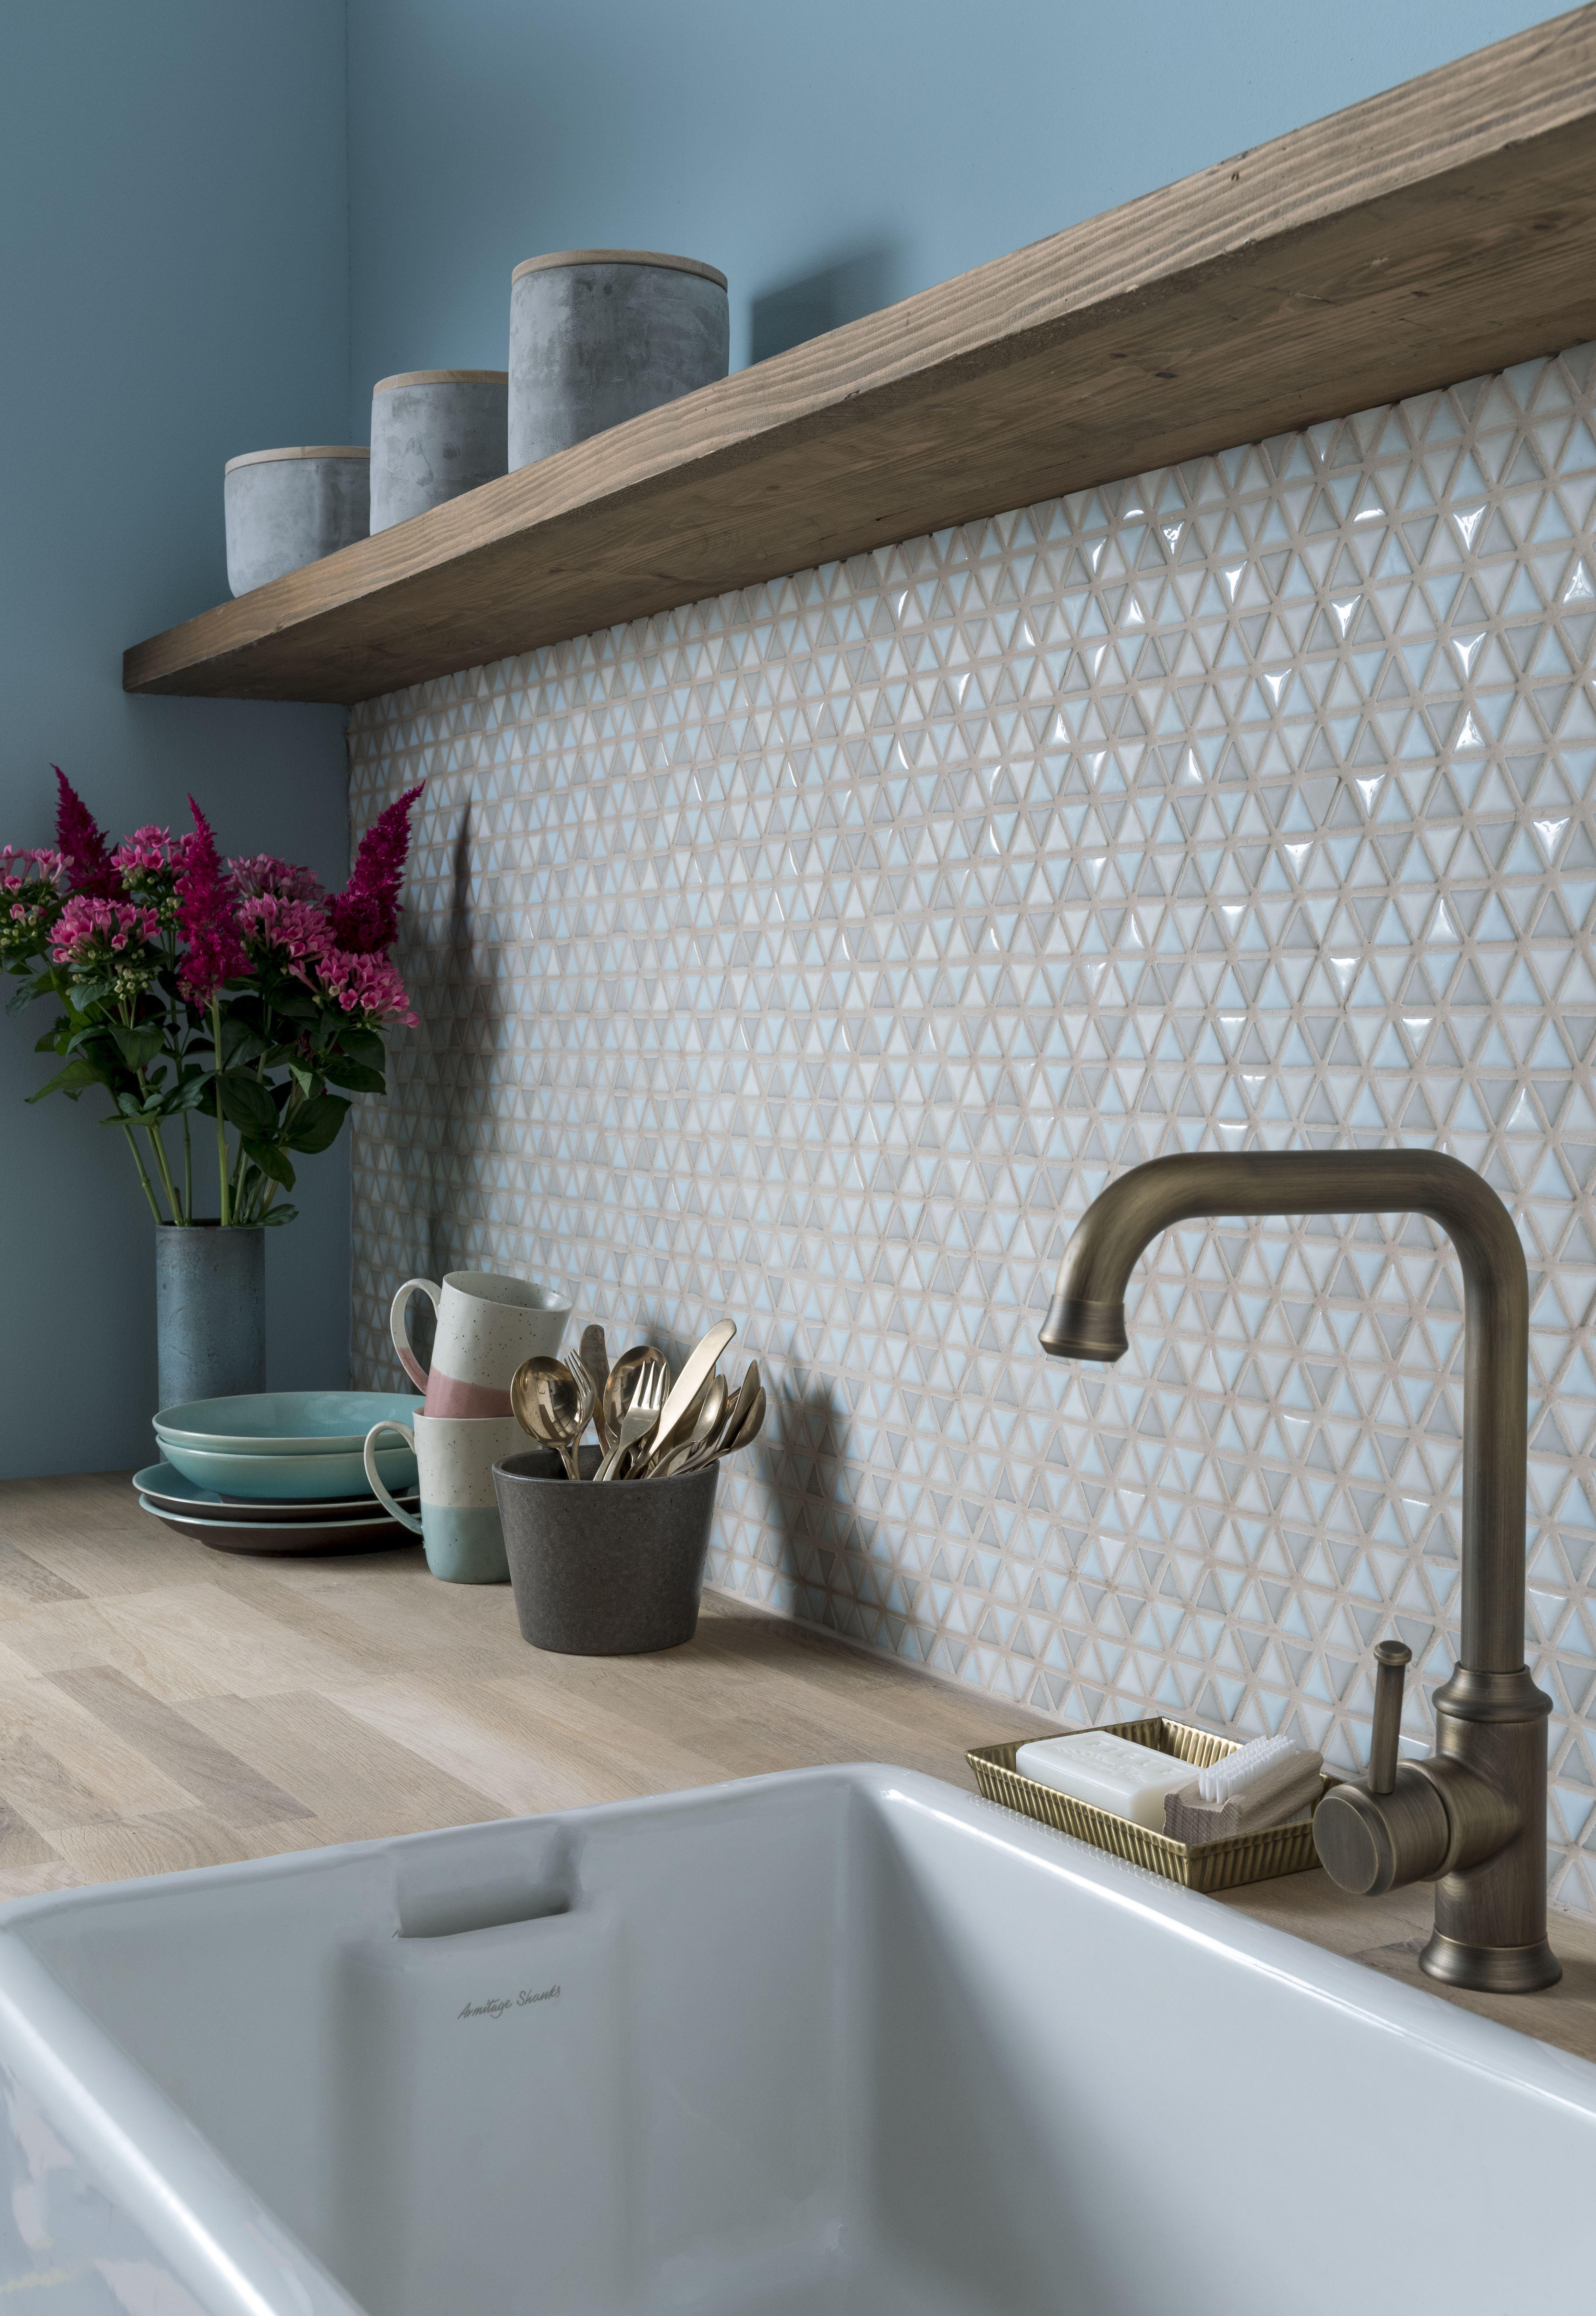 20 beautiful kitchen splashback ideas to copy